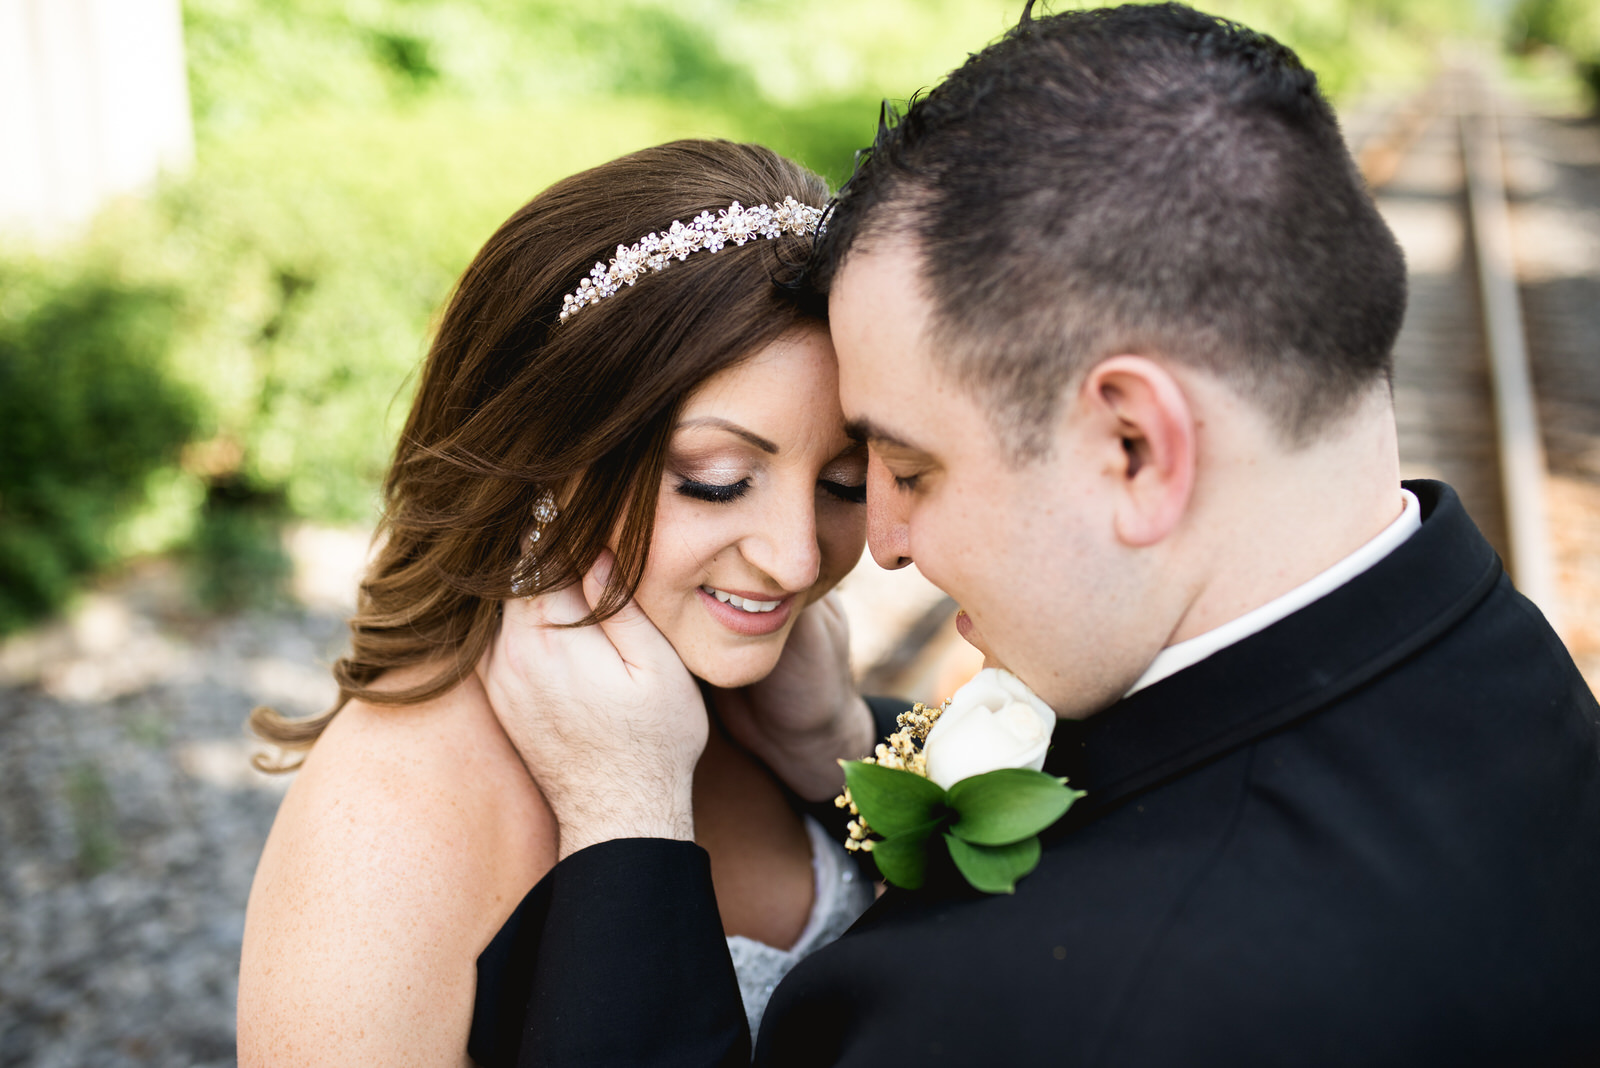 Laube_Banquet_Hall__Wedding_Photos_013.jpg